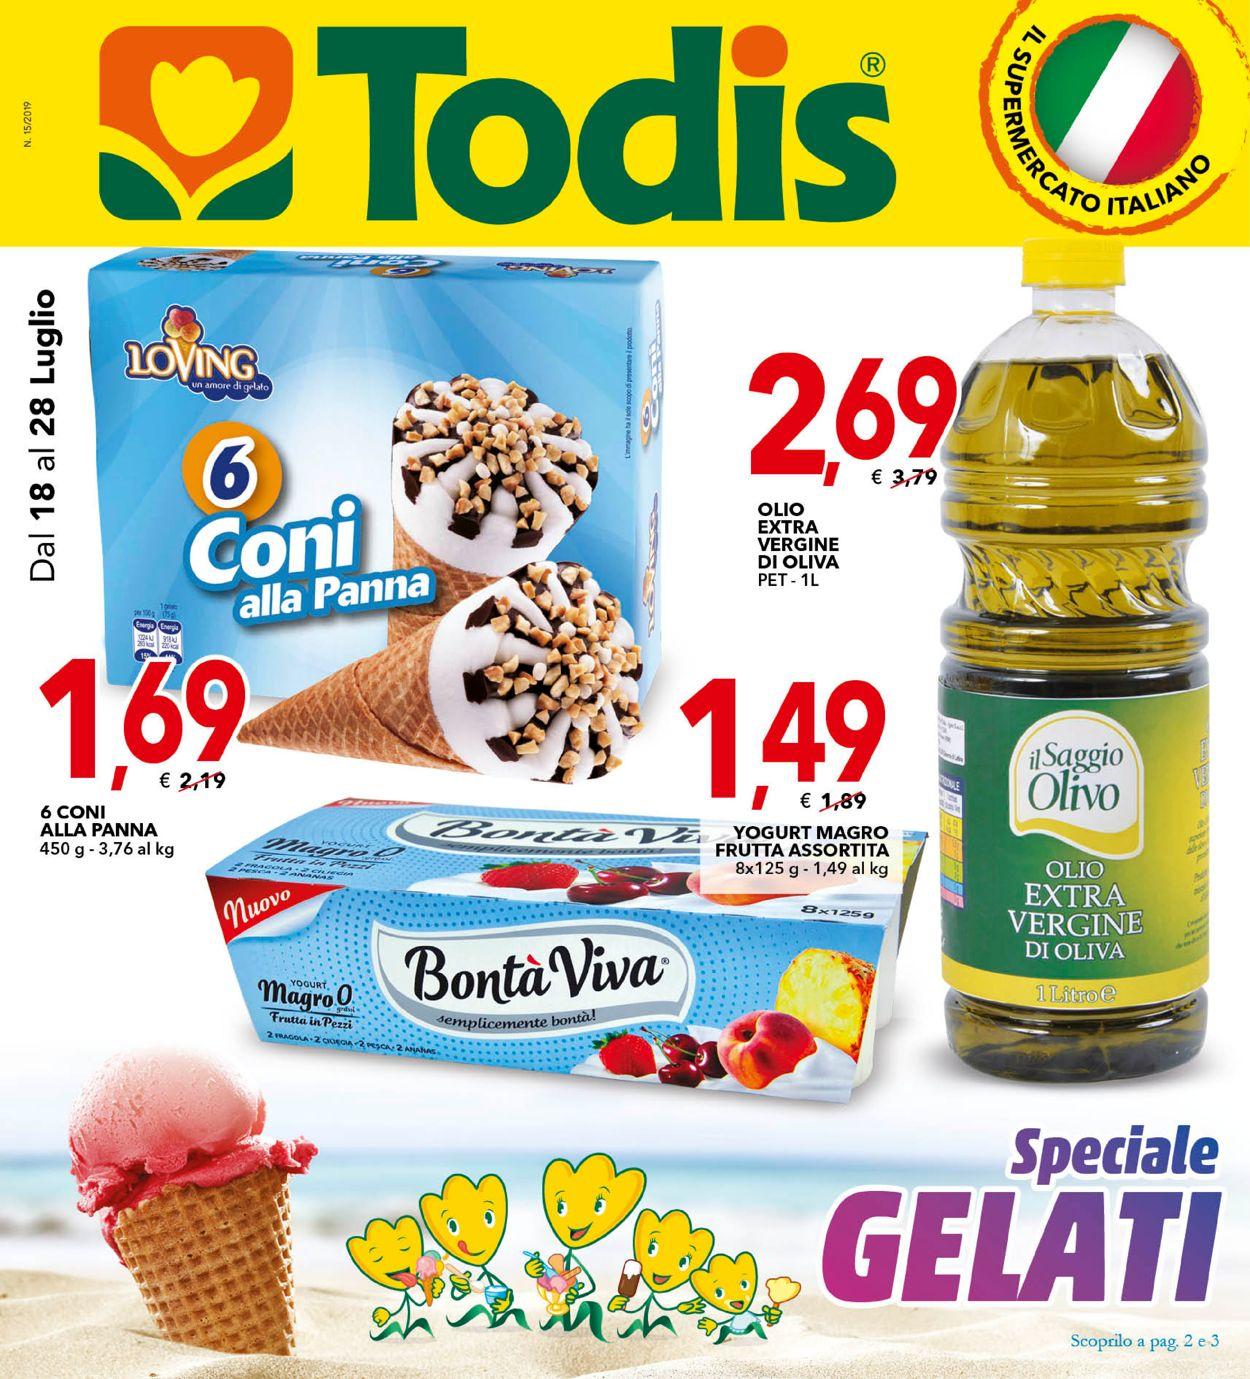 Volantino Todis - Offerte 18/07-28/07/2019